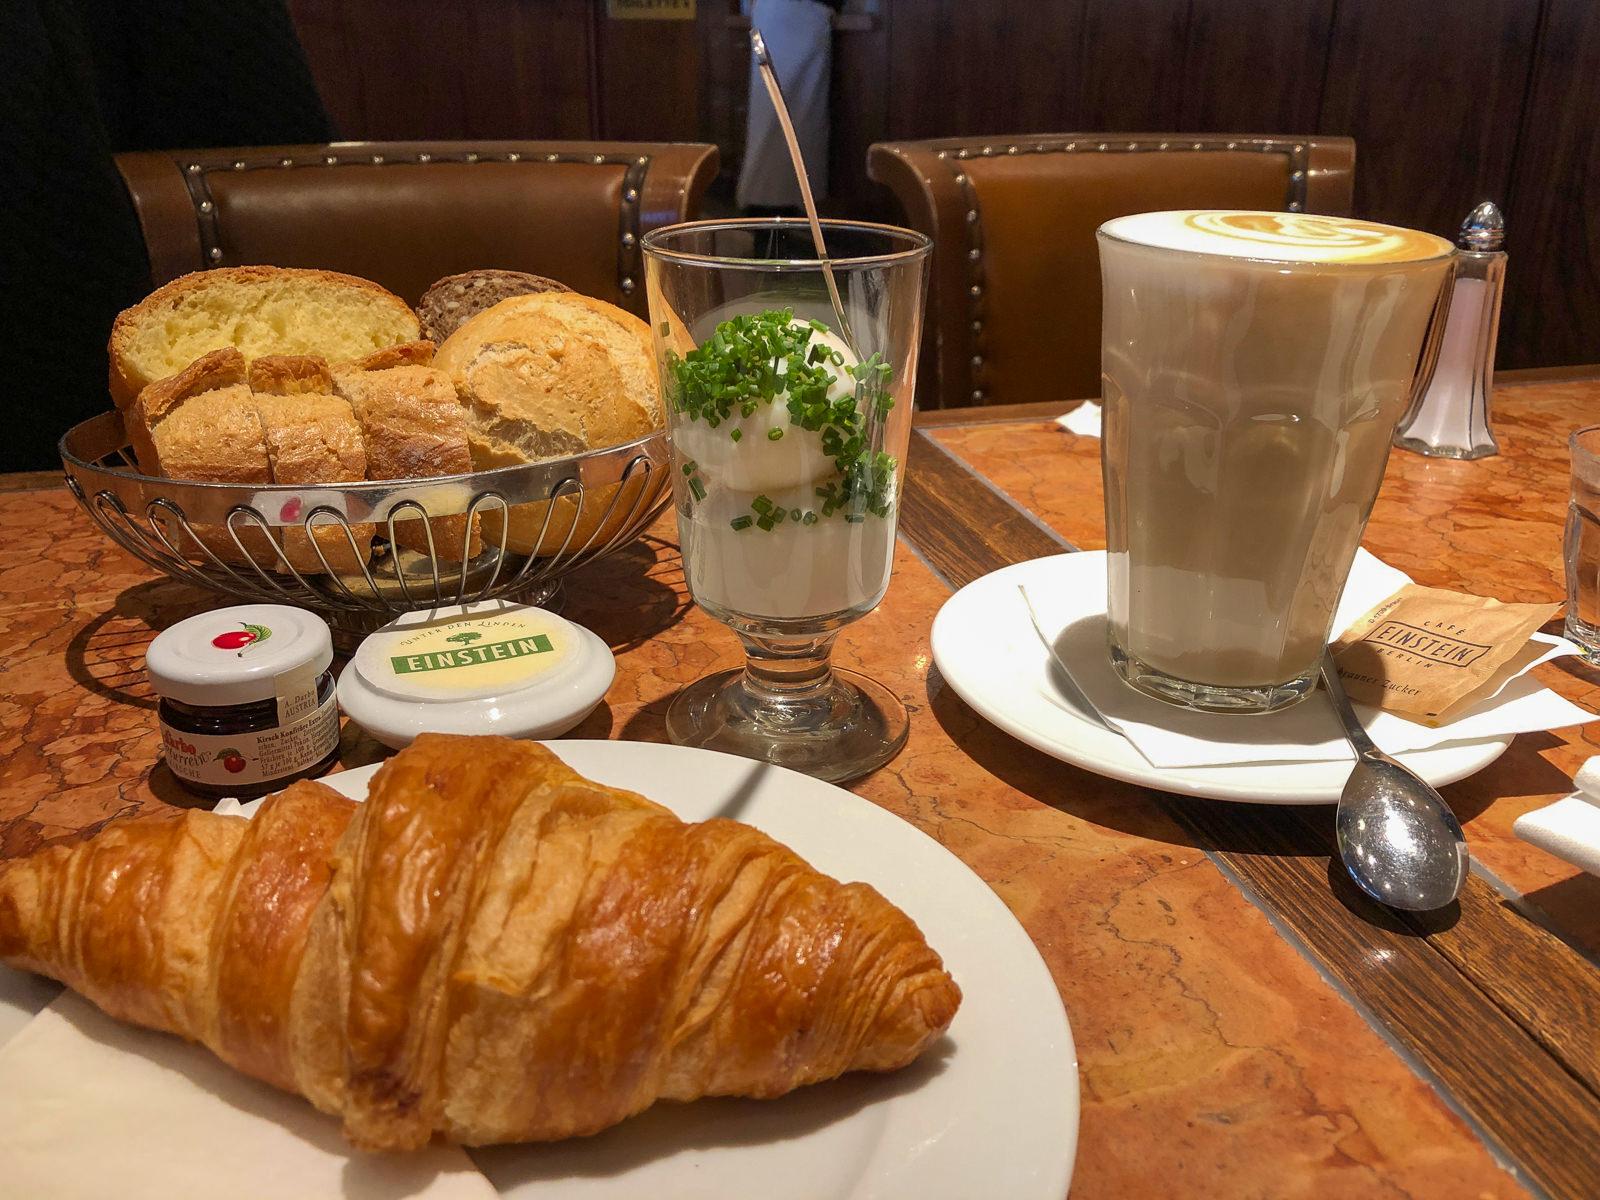 berlin, frühstück, café, cafe, kaffee